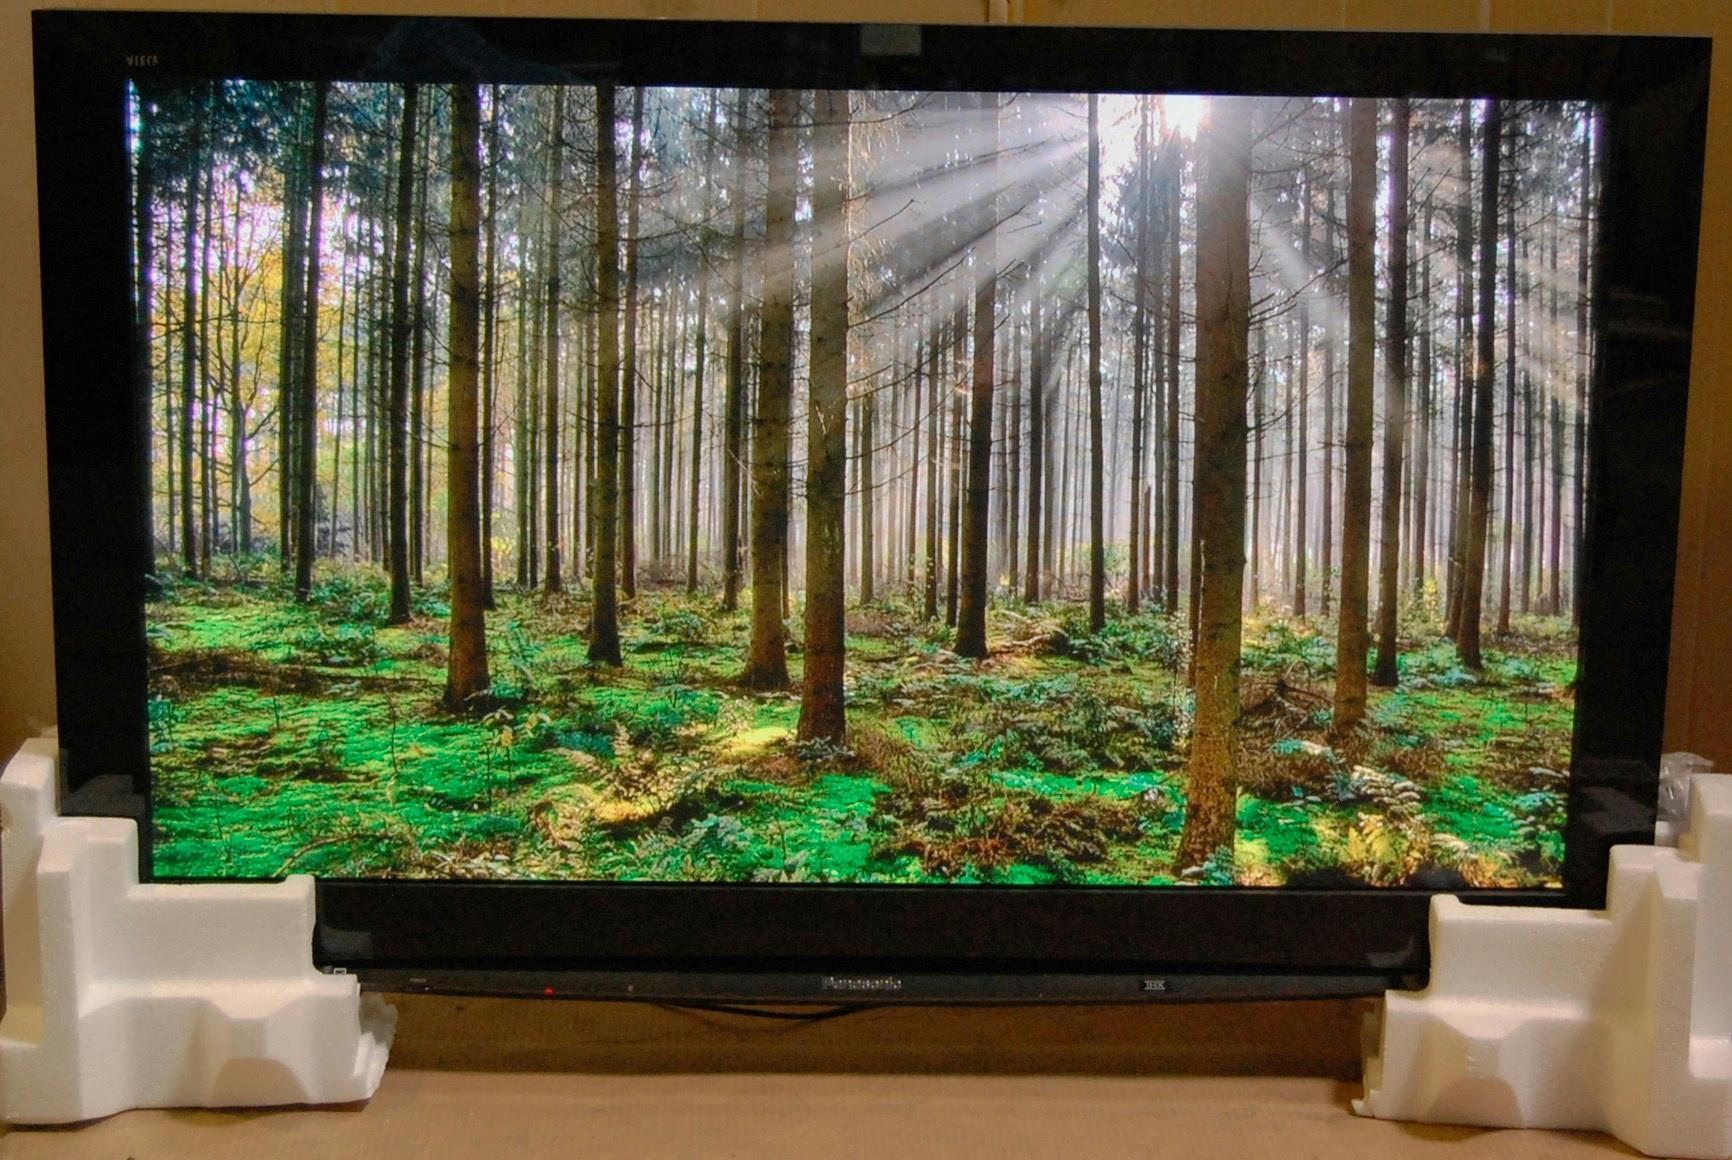 "Panasonic Viera TH-50PZ80U 50"" 1080p Plasma TV, 1920 x 1080, HDMI - 800112059"